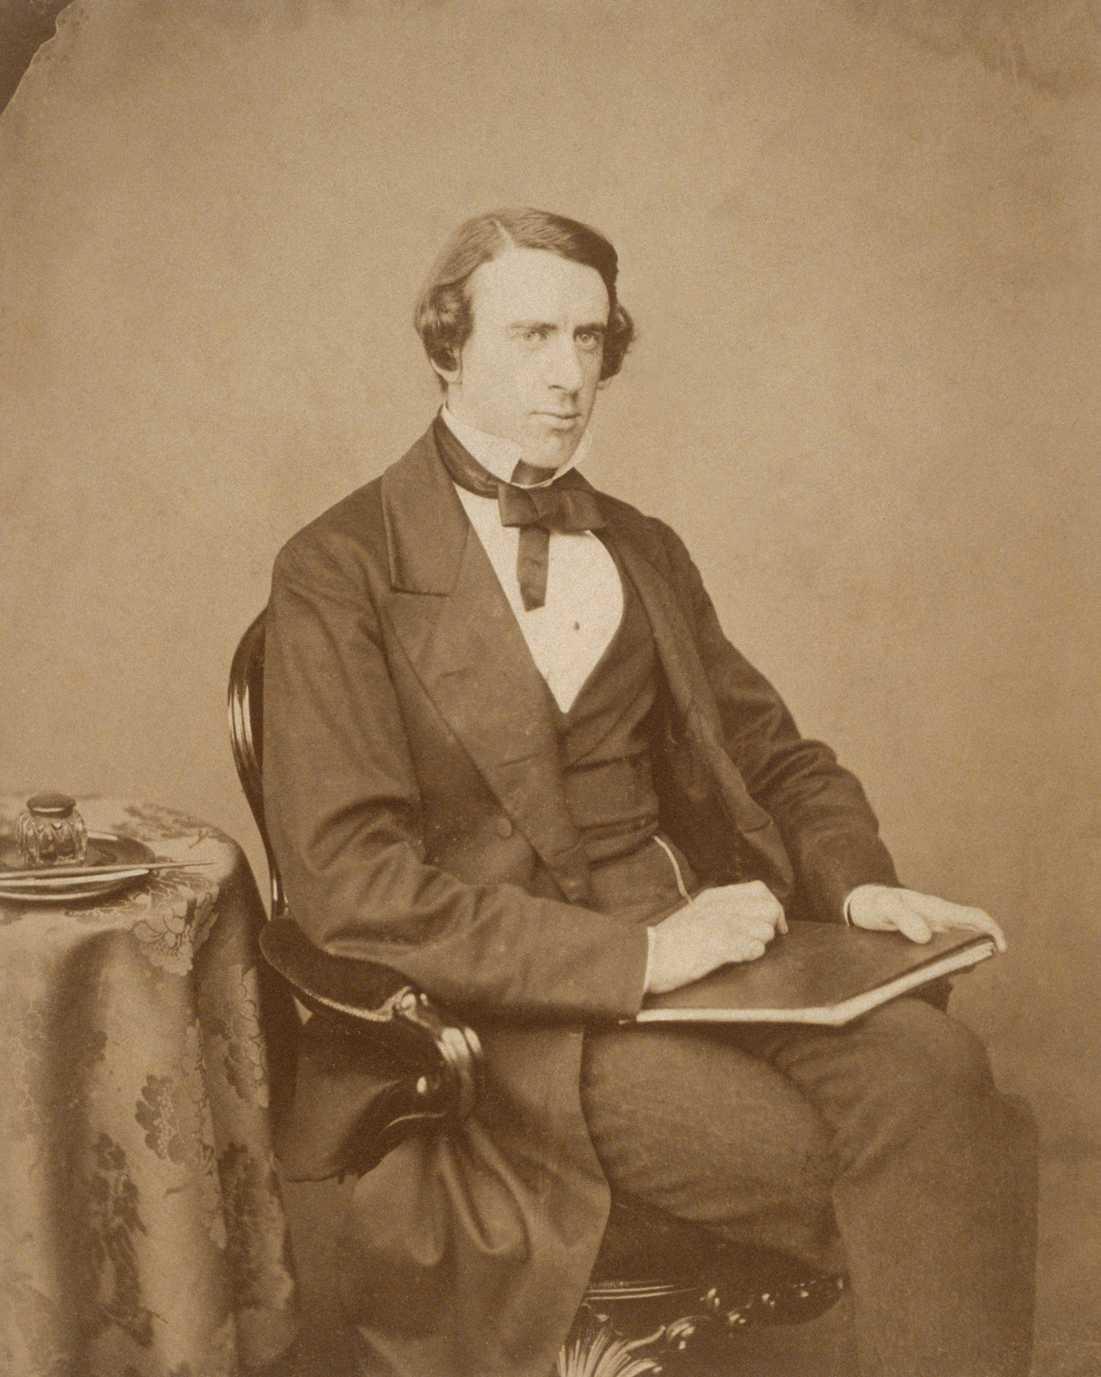 Stephen {{circa 1860}}